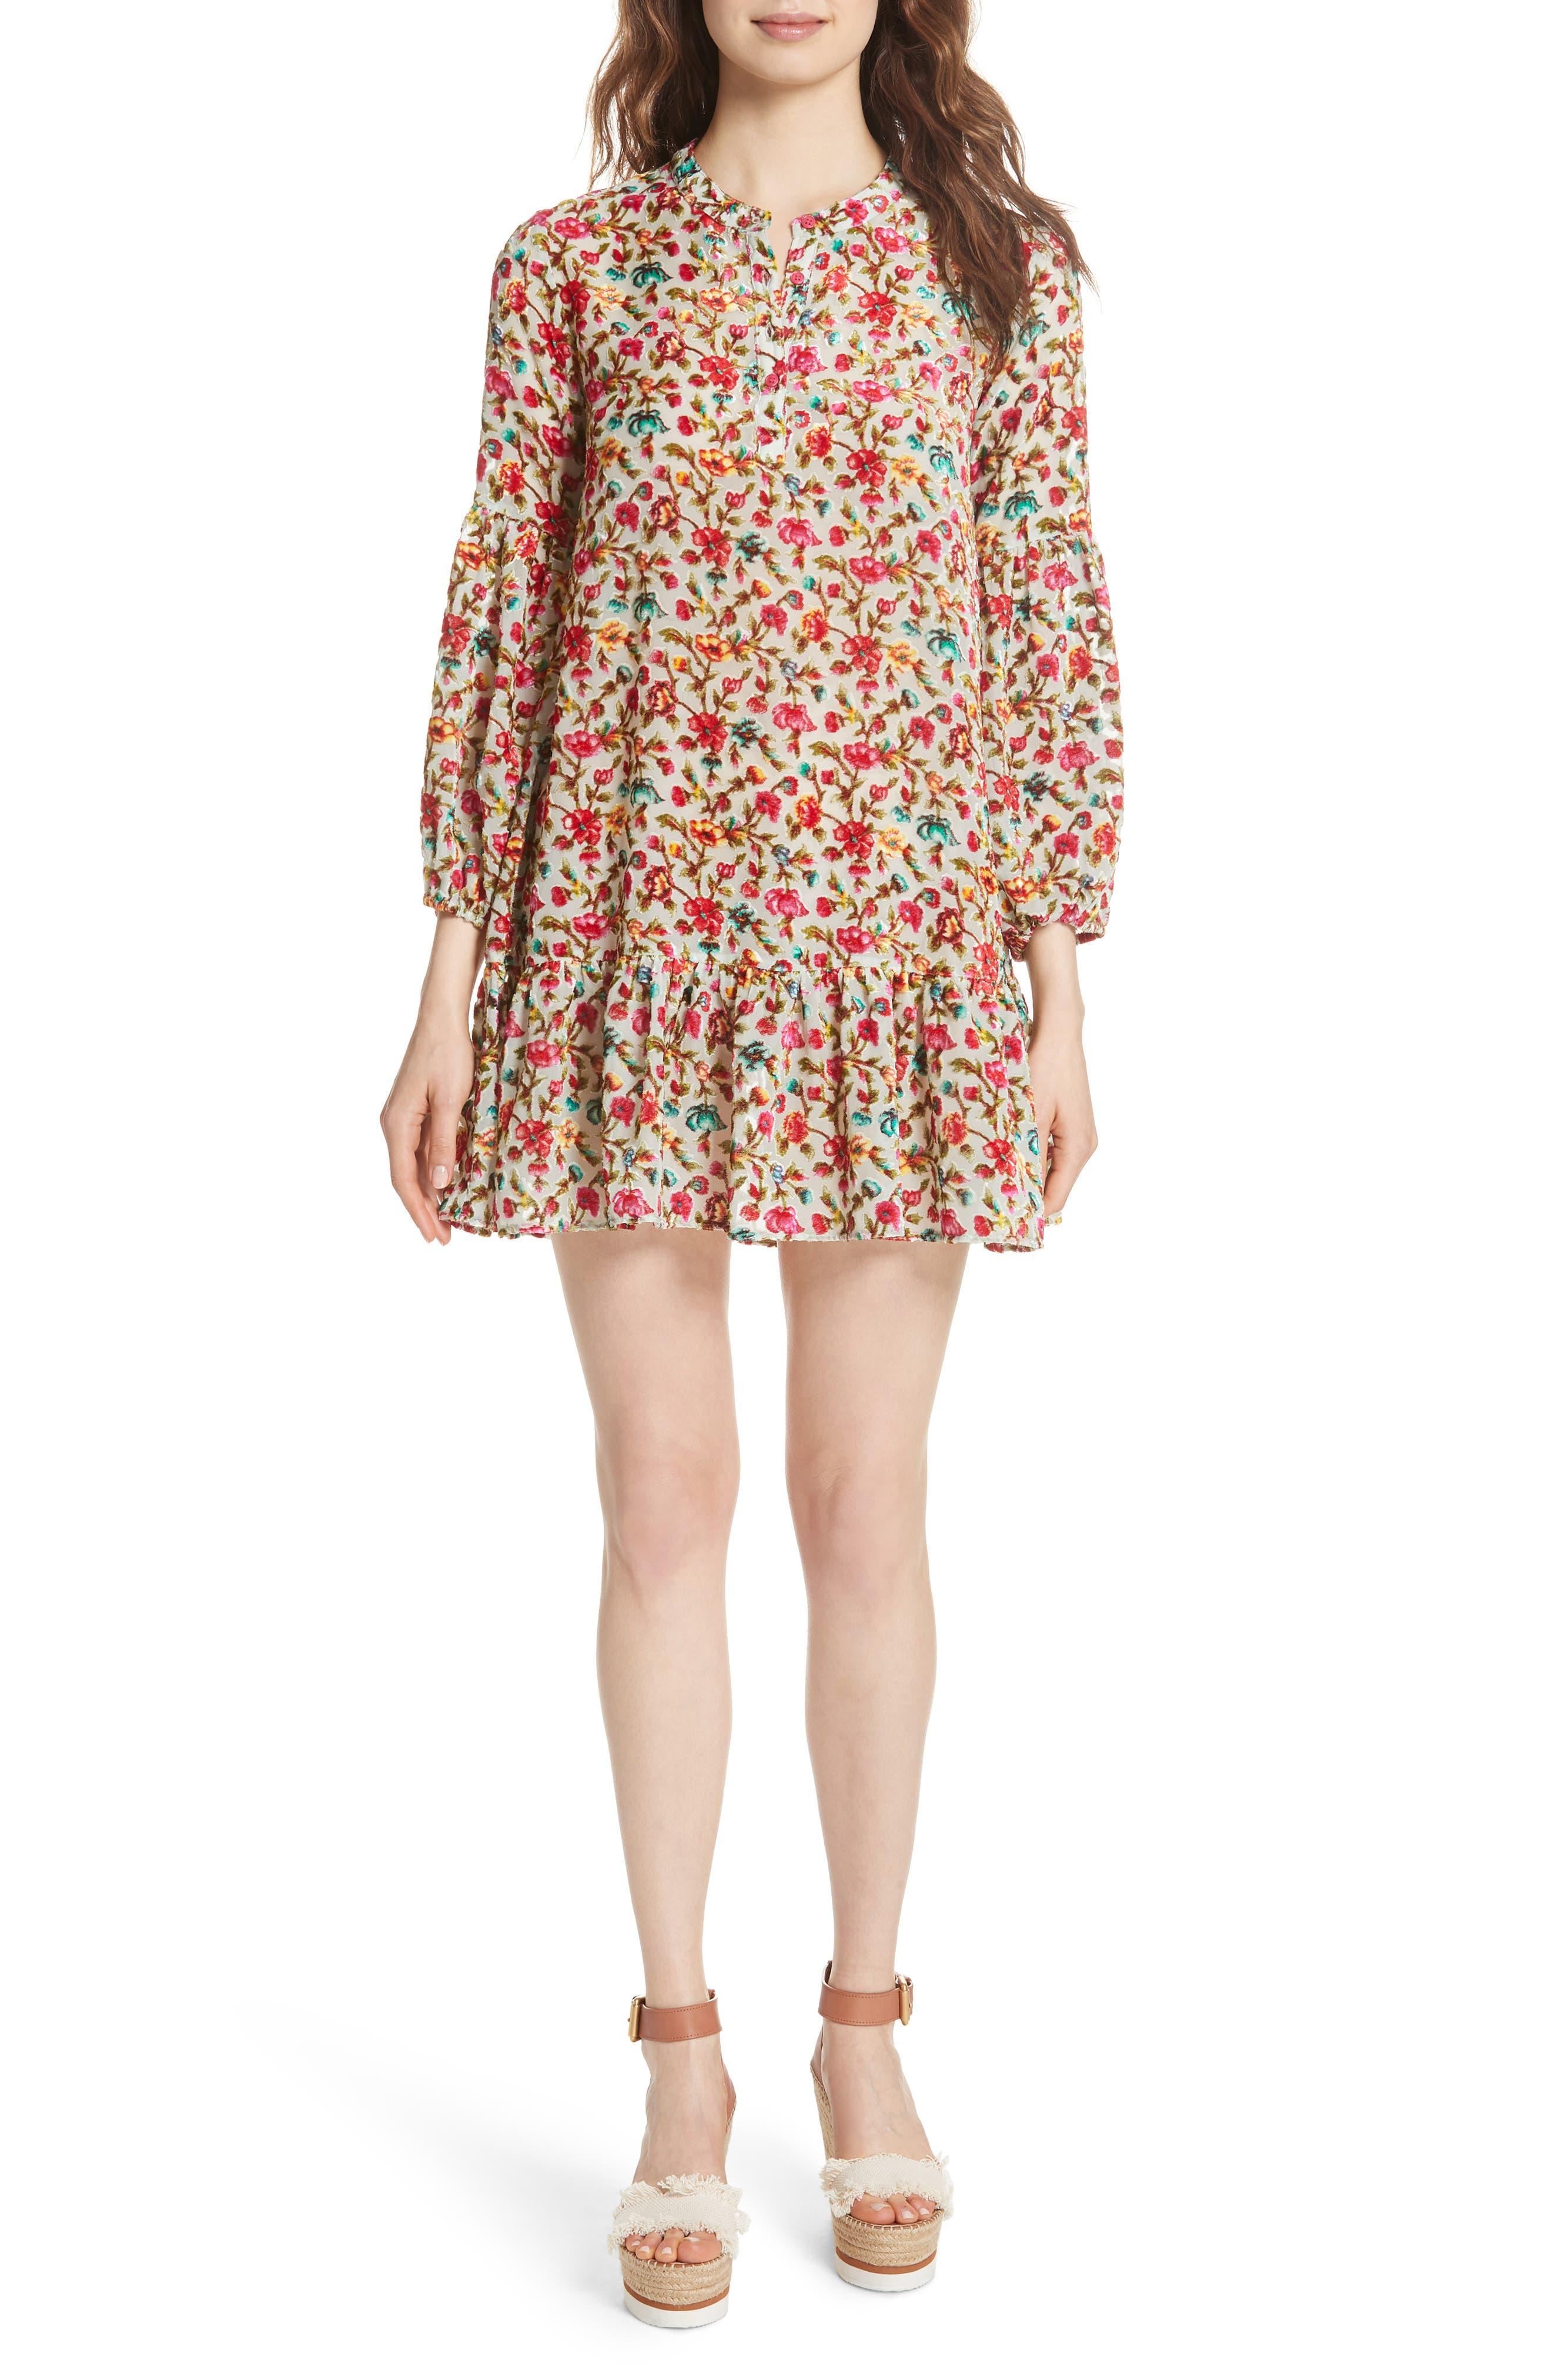 Simpson Printed Dress,                             Main thumbnail 1, color,                             693